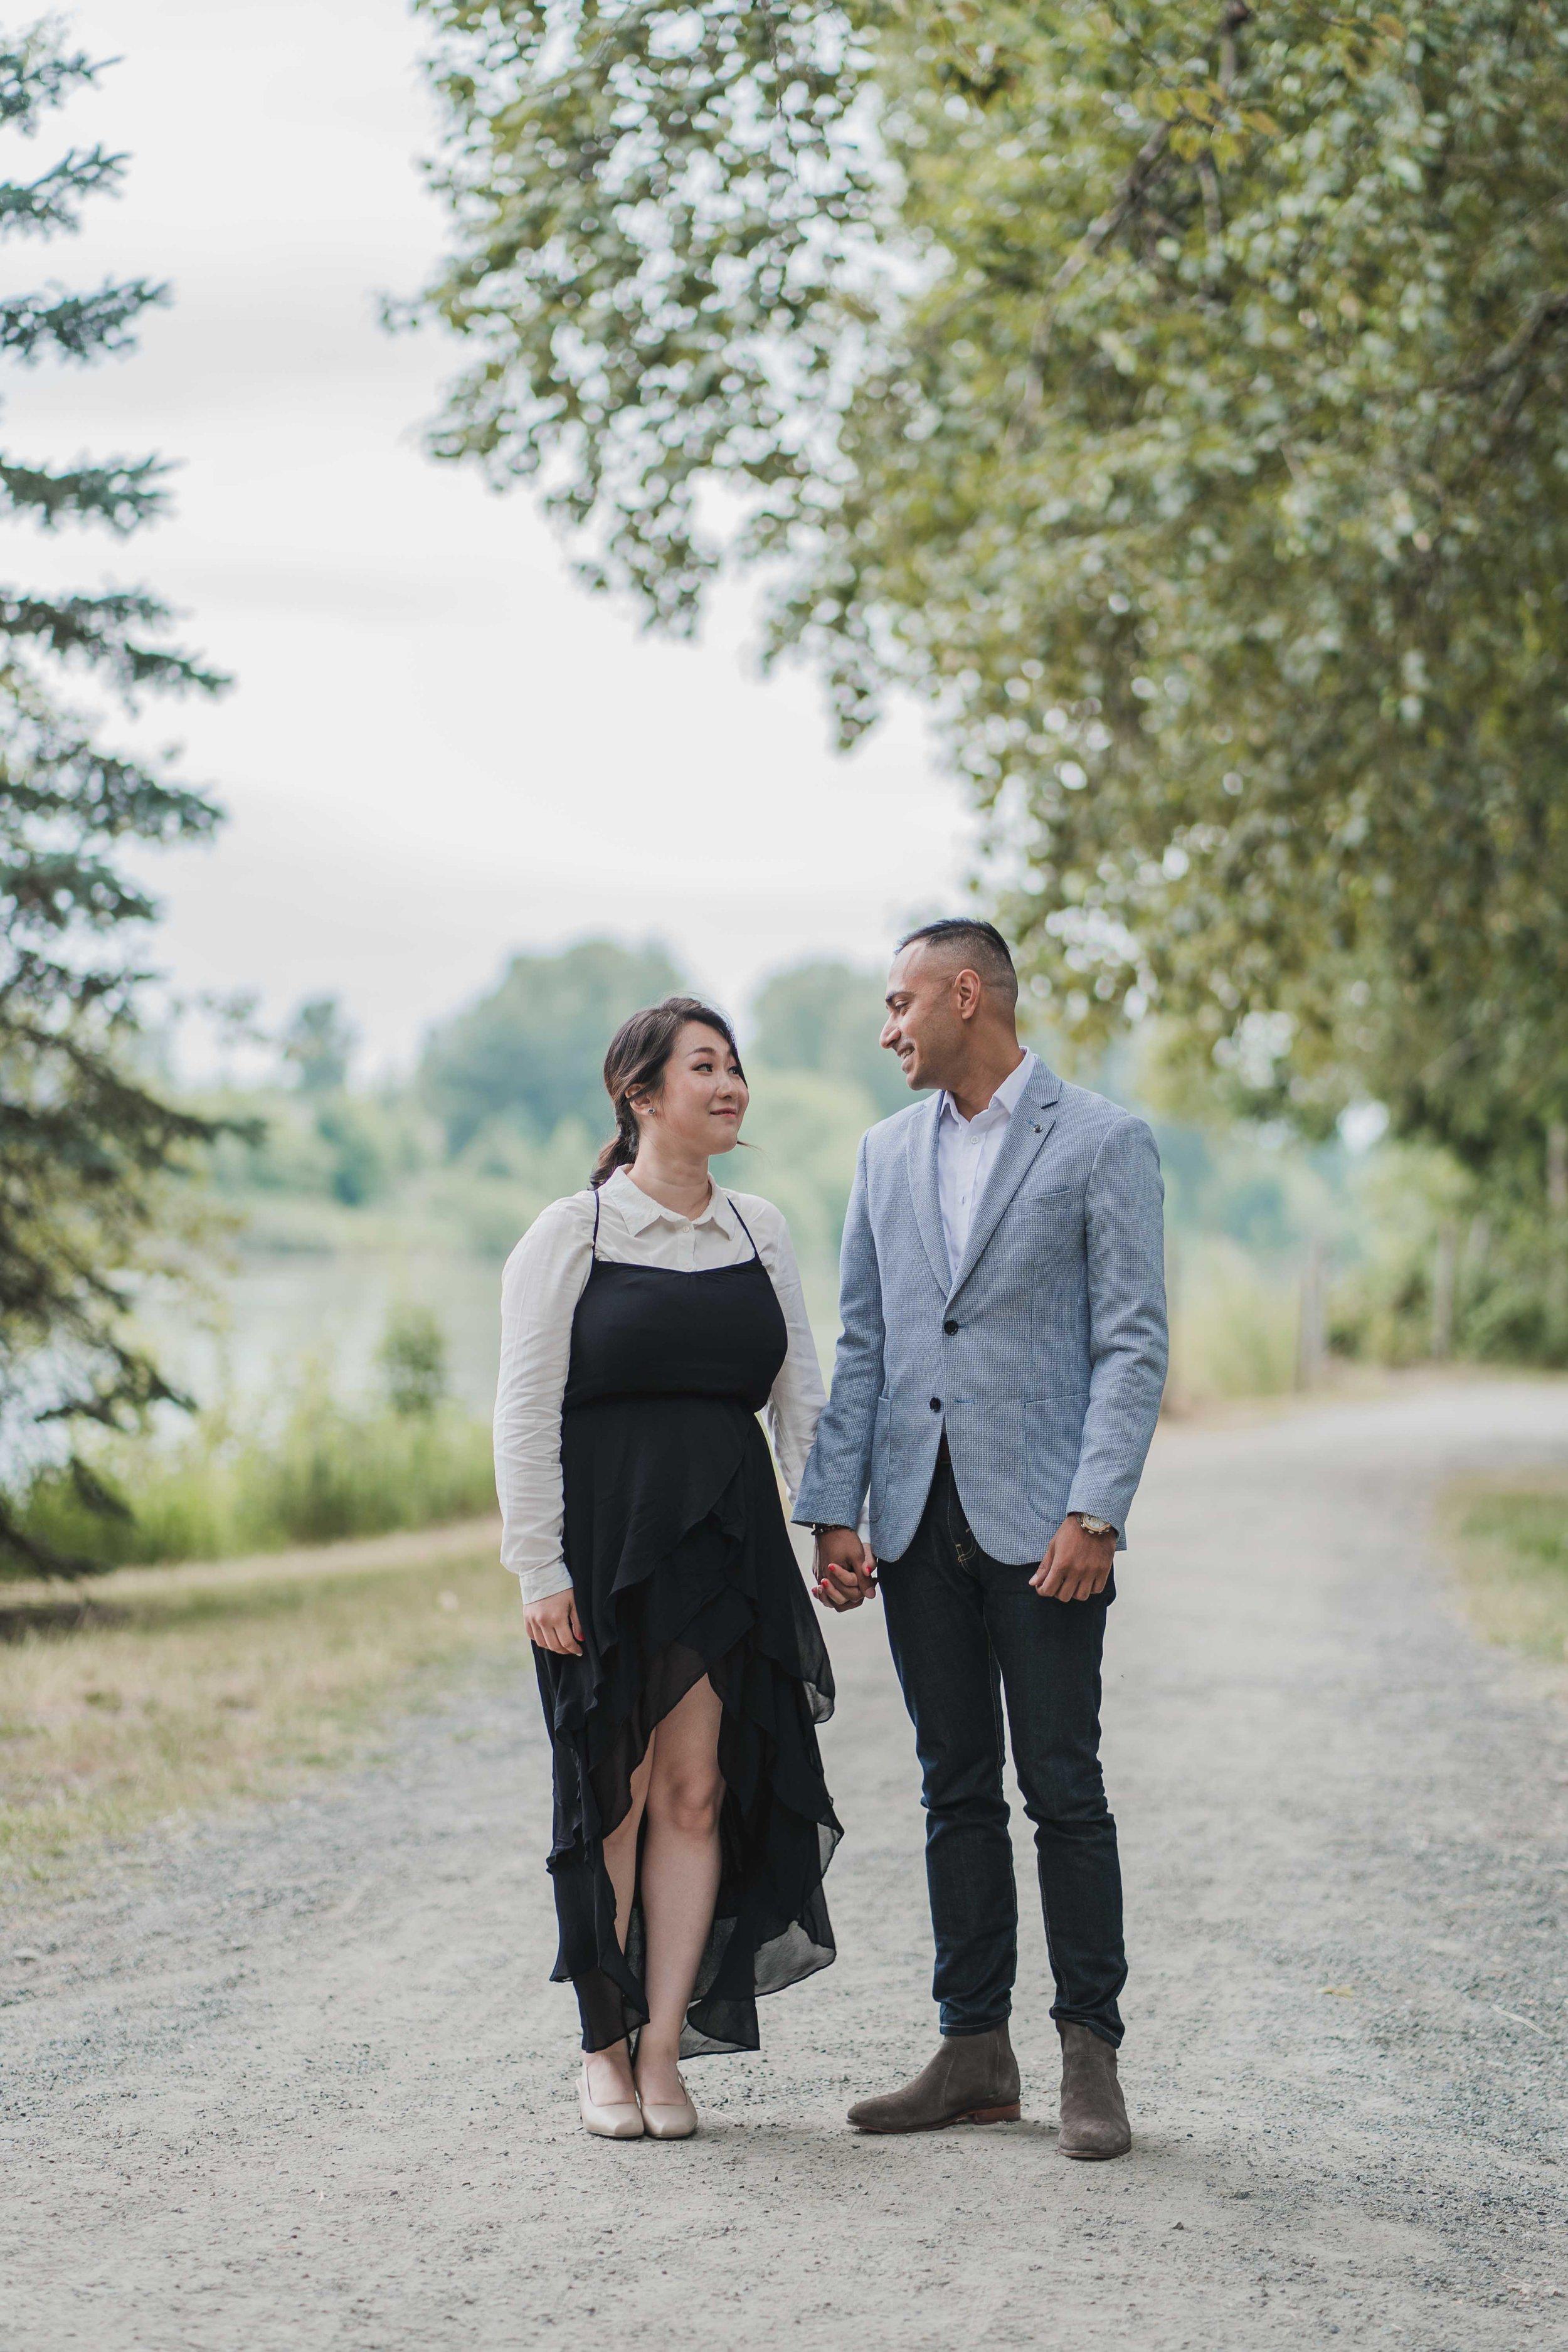 20190622 - Monika & Johnson Engagement - 0088.jpg